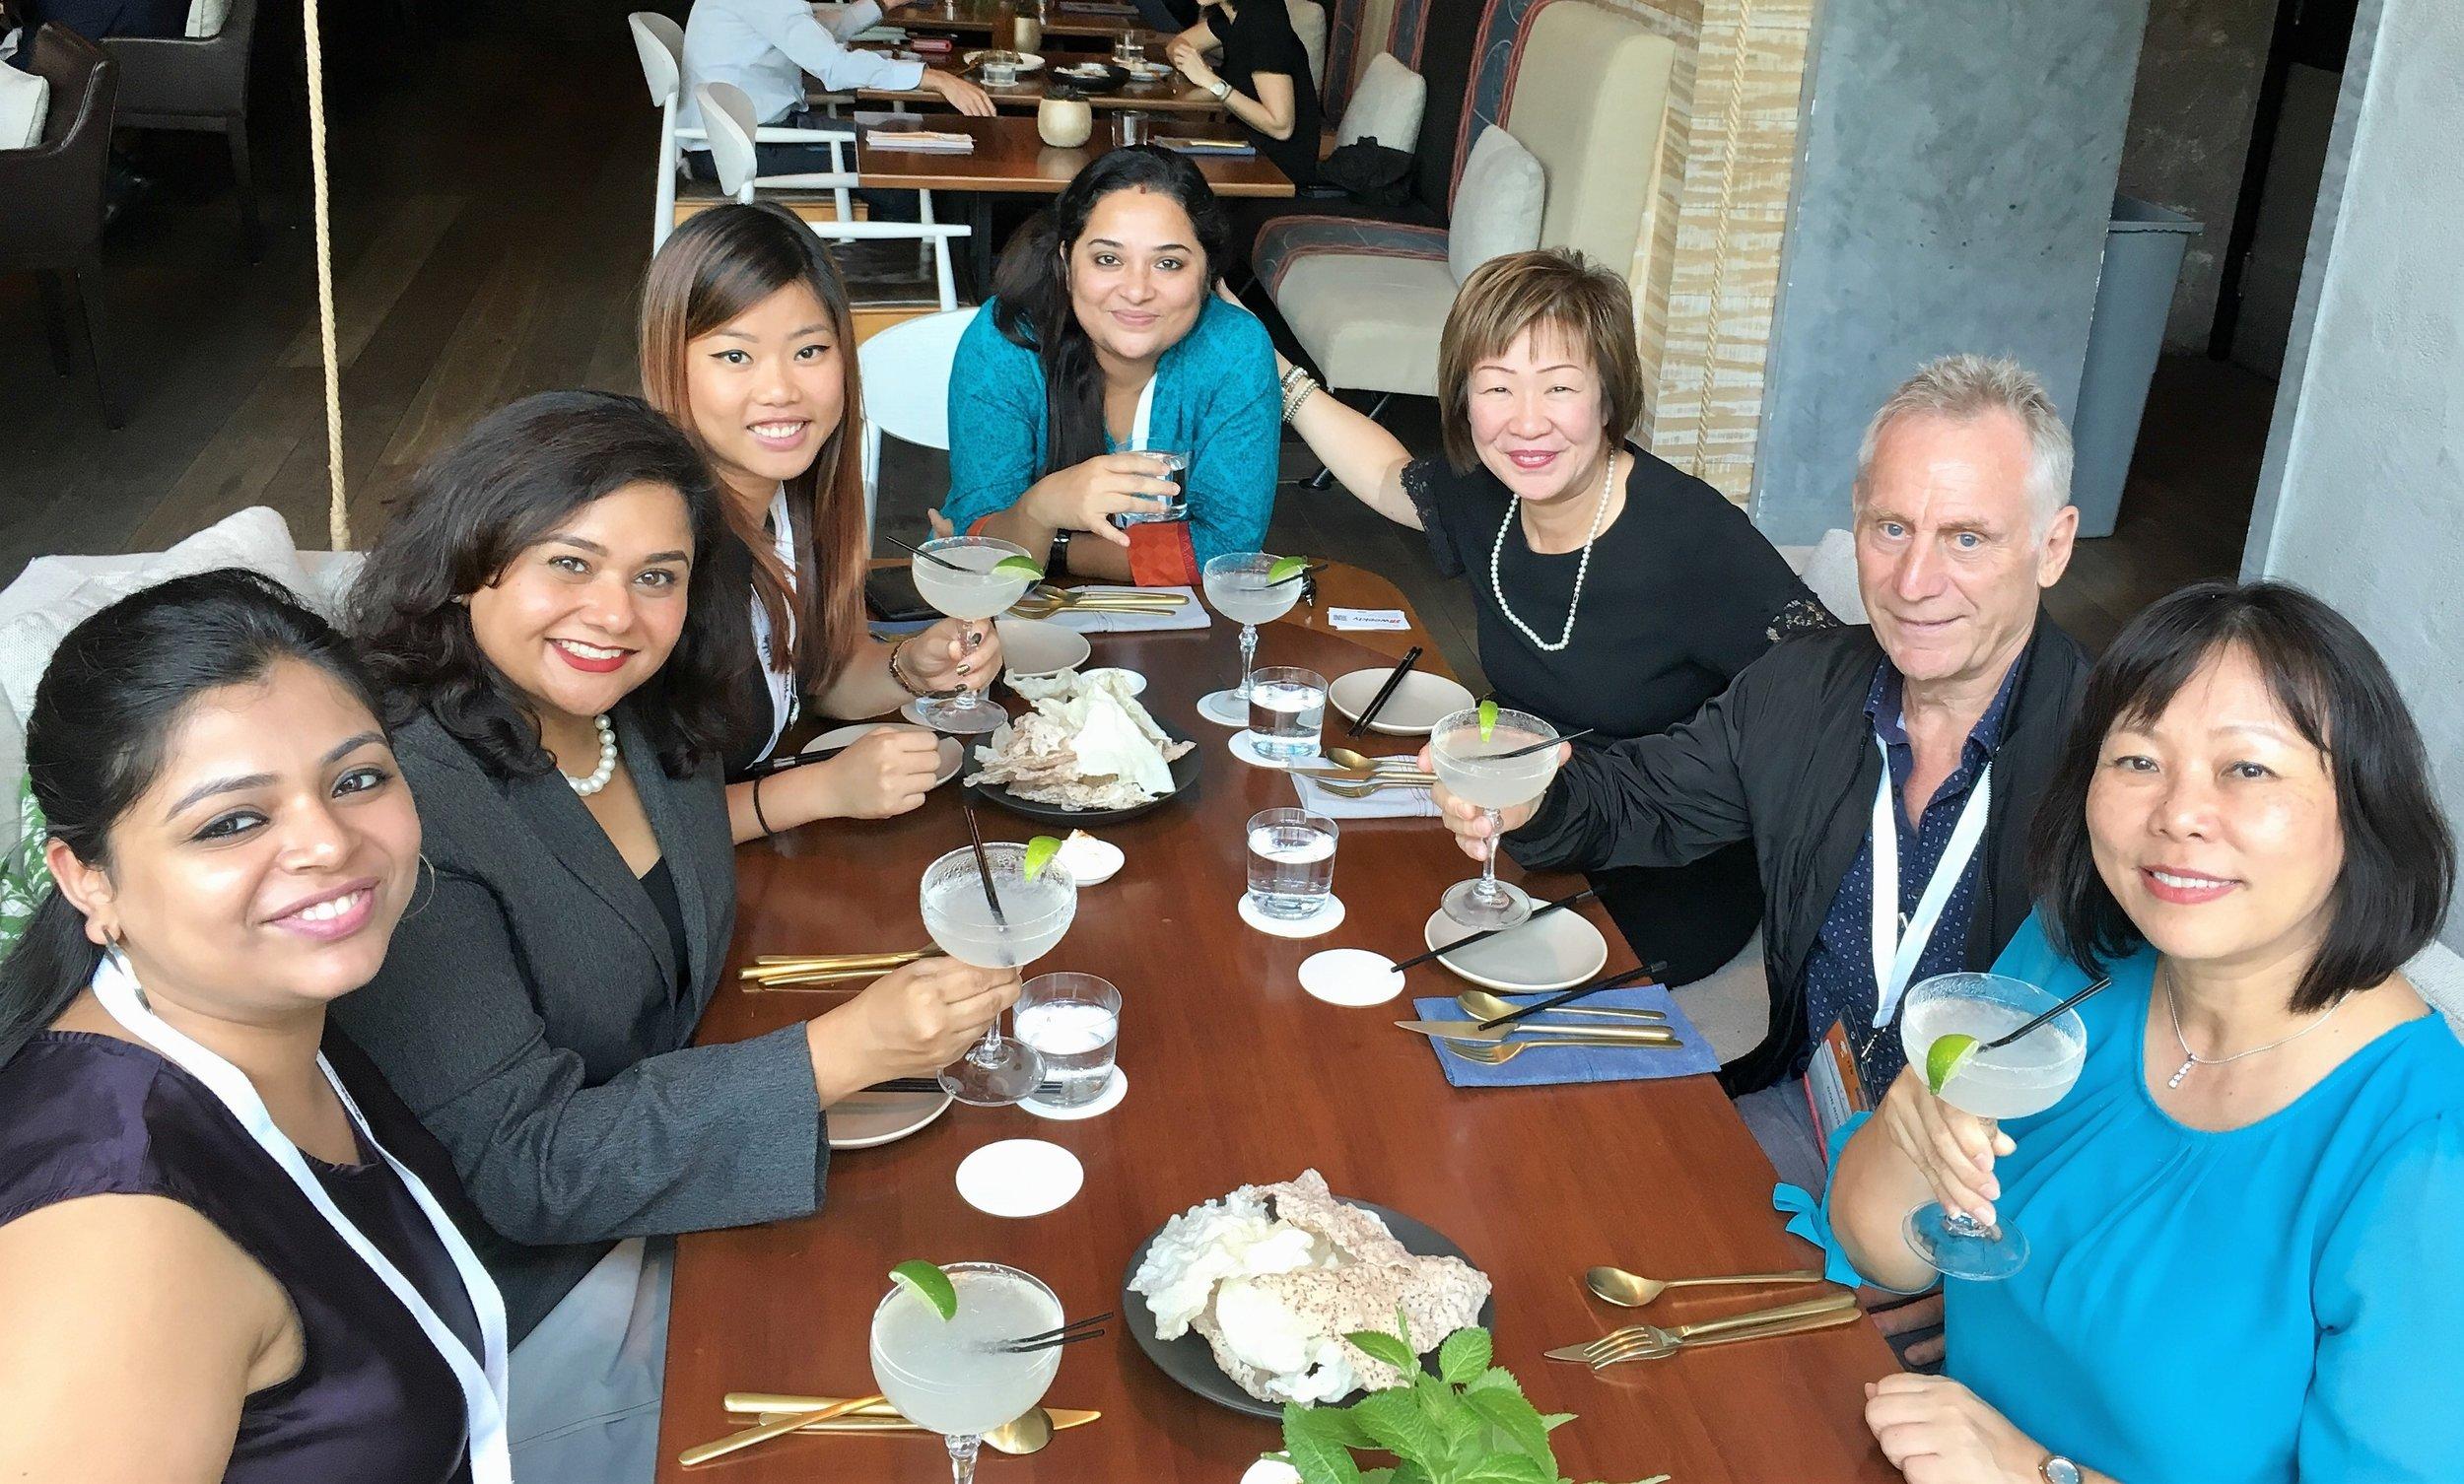 From left to right: Ms Jasleen Kaur (Media India Group), Ms Jagdish Sandhu (CEO, FLA), Ms Gina Sin (Biz Events Asia),Ms June Mukherjee (Media India Group), Ms Aileene Thangaveloo (Director - Marketing, FLA), Mr Don Ross (TTR), Ms Serene Law (VP, FLA).